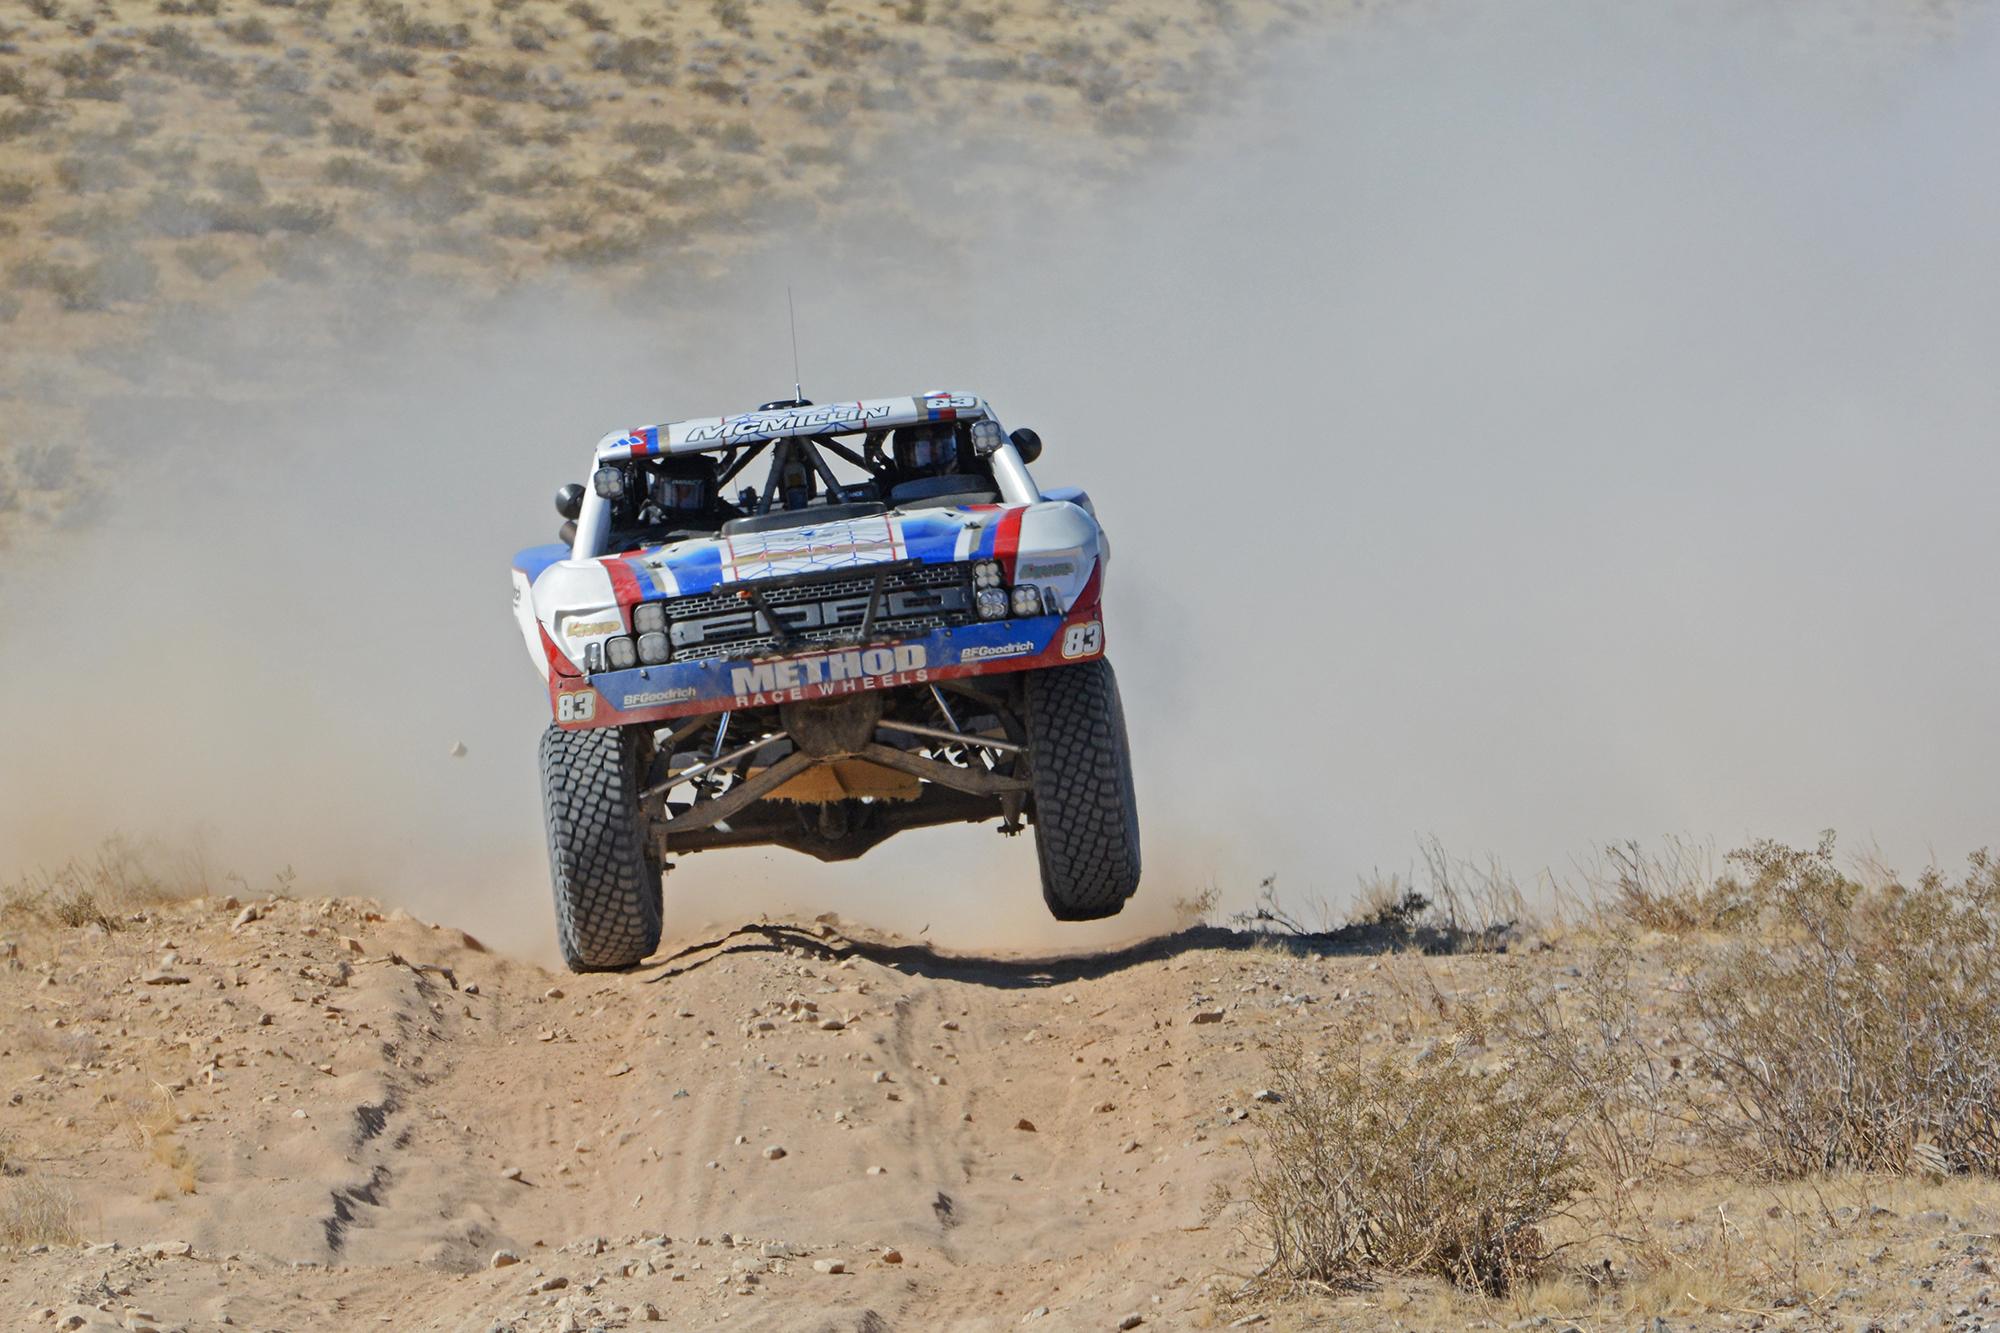 Trophy Truck in Baja at speed